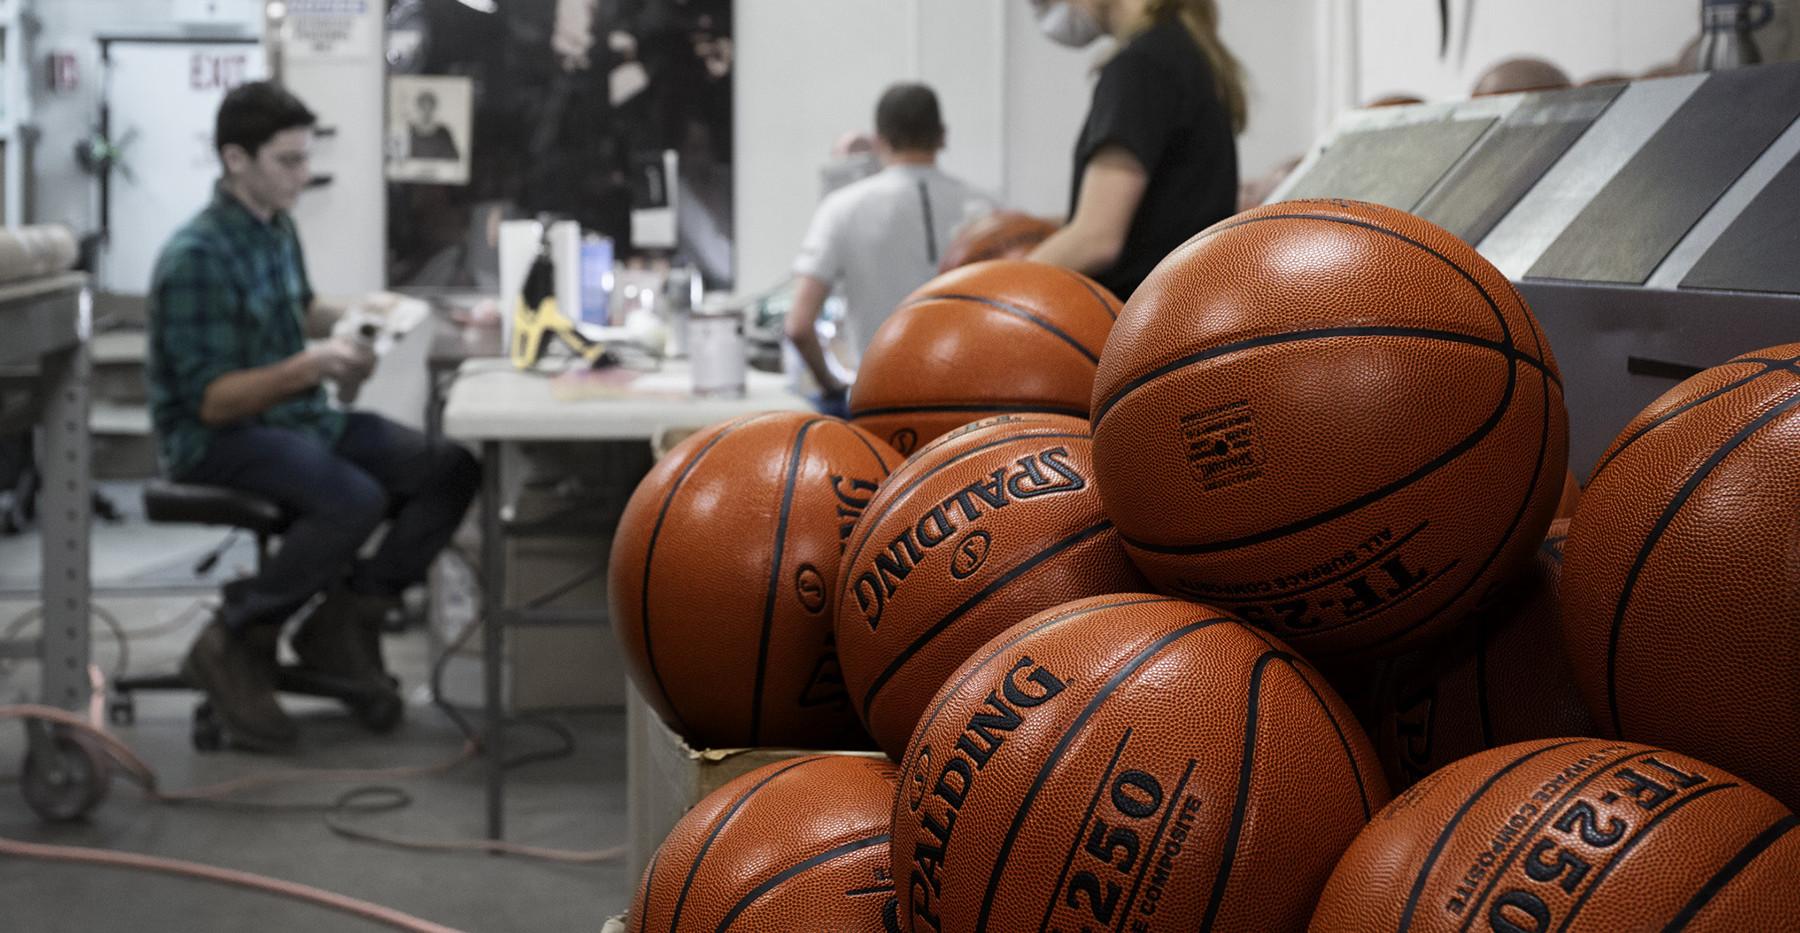 Basket Balls_Shop.jpg